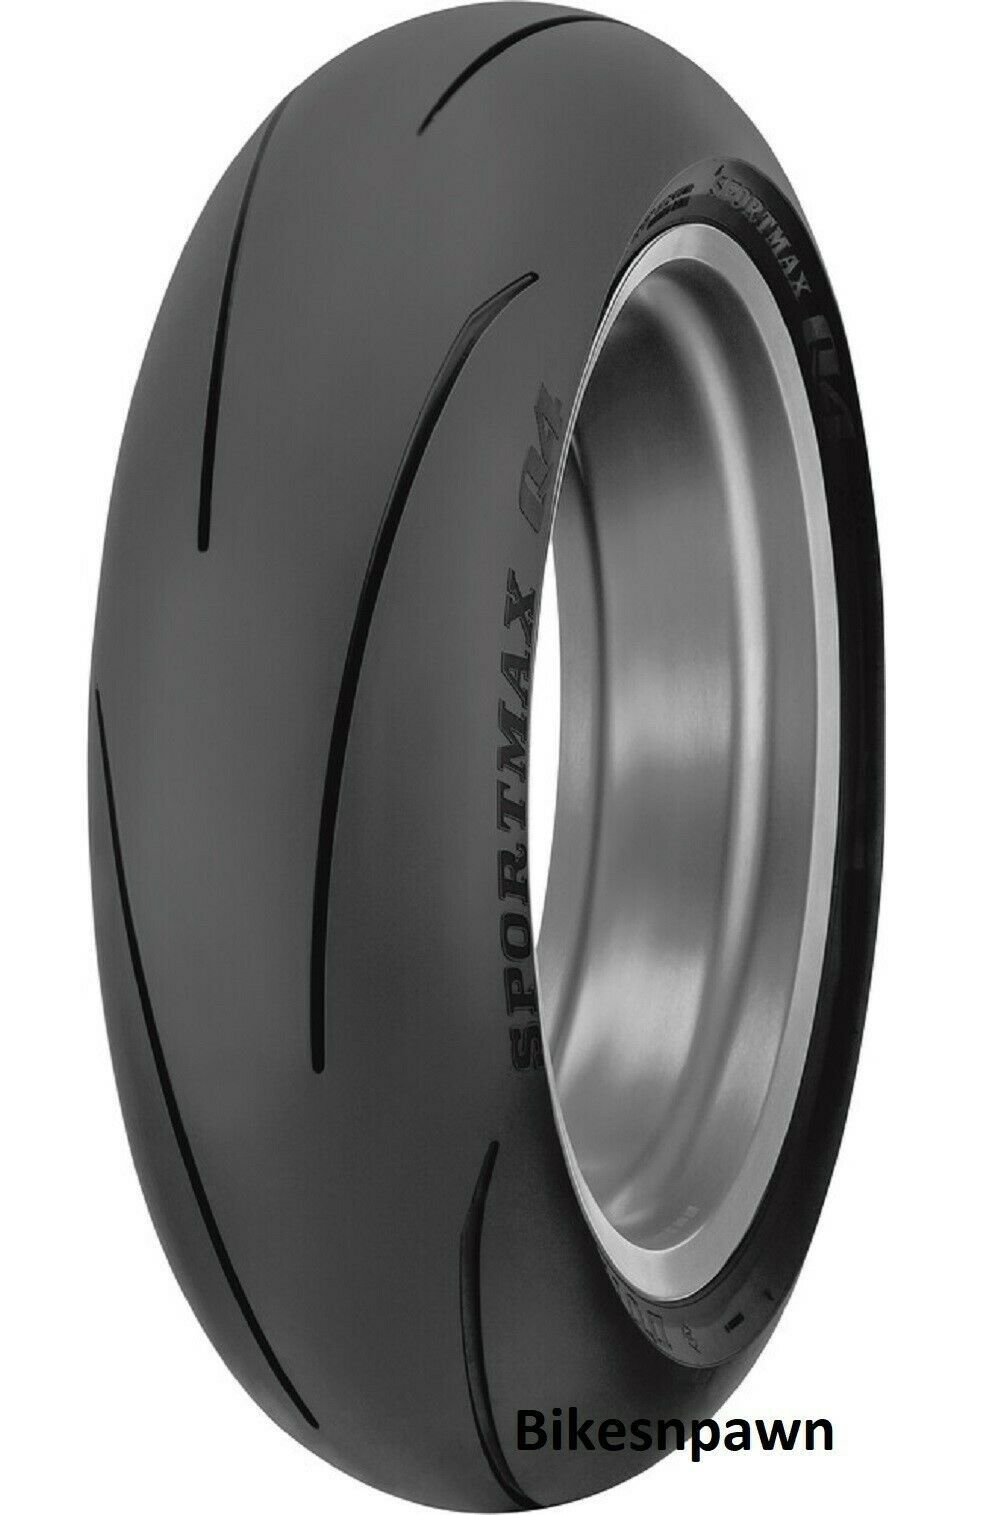 New 190/50ZR17 Dunlop Q4 Sportmax Rear Radial Motorcycle Tire 73W TL